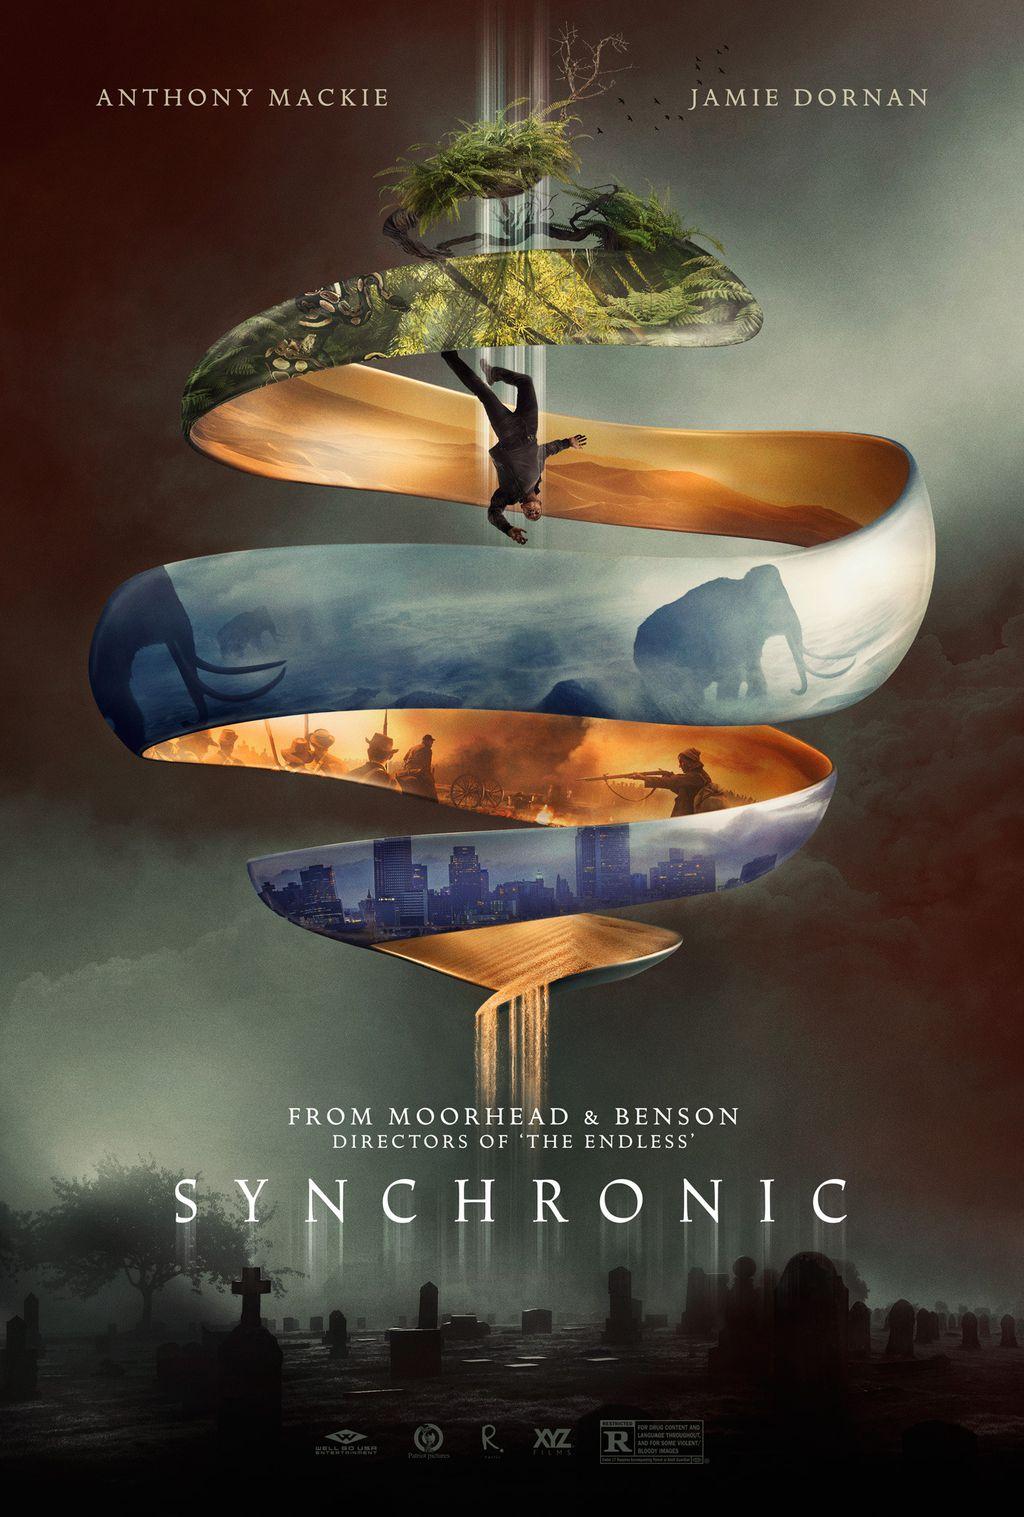 Synchronic   Anthony Mackie e Jamie Dornan estrelam trailer de horror sci-fi - 2